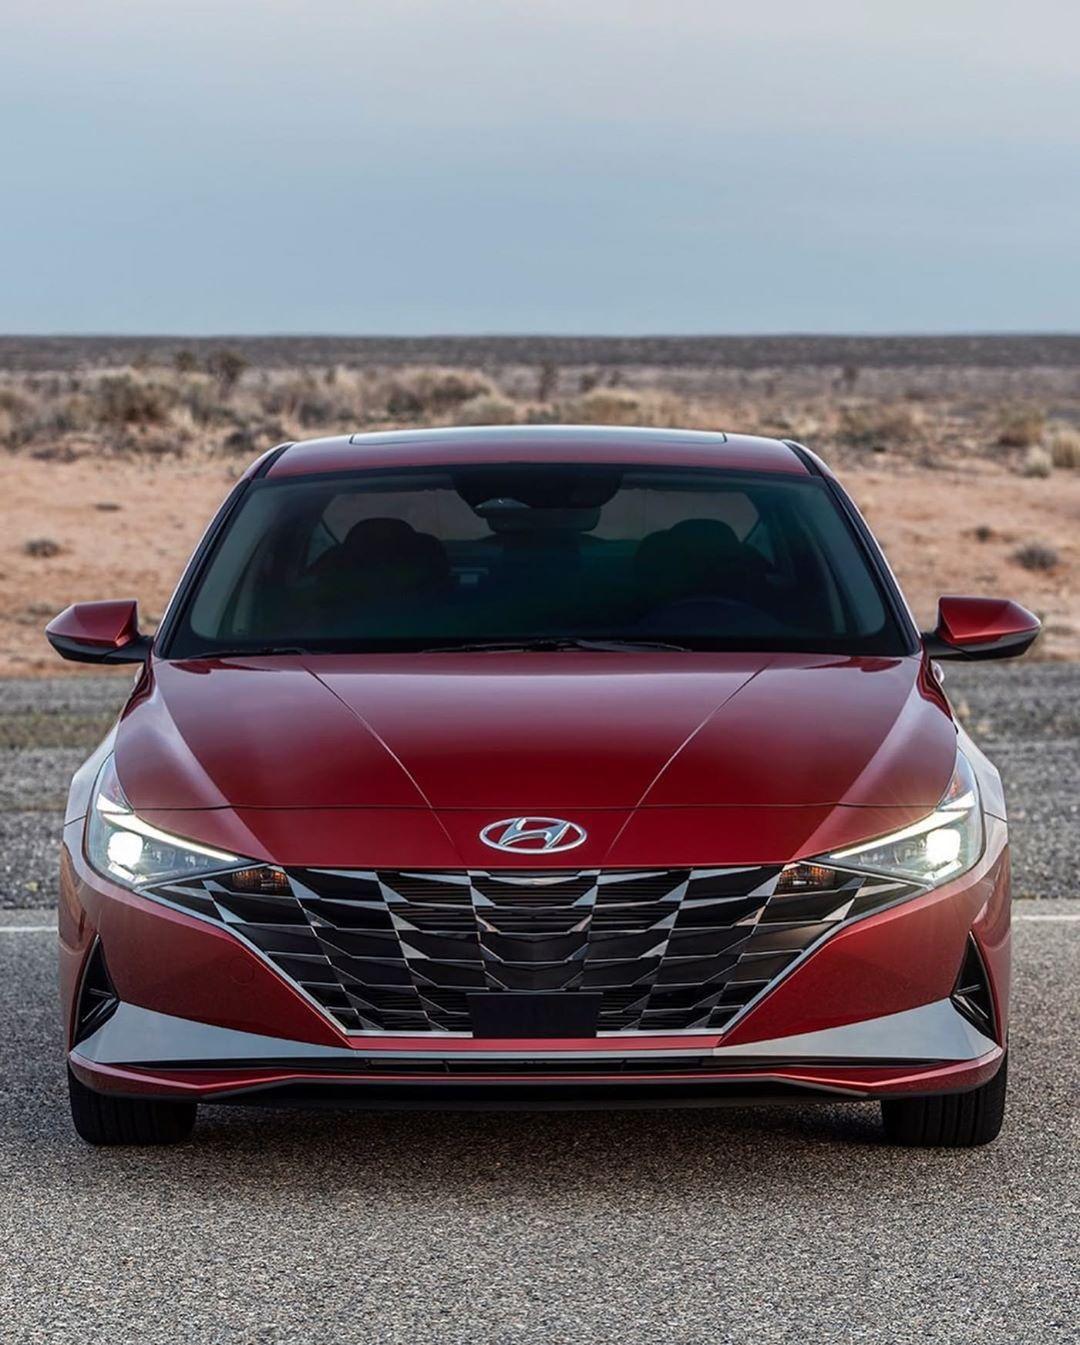 The 2021 Hyundai Elantra